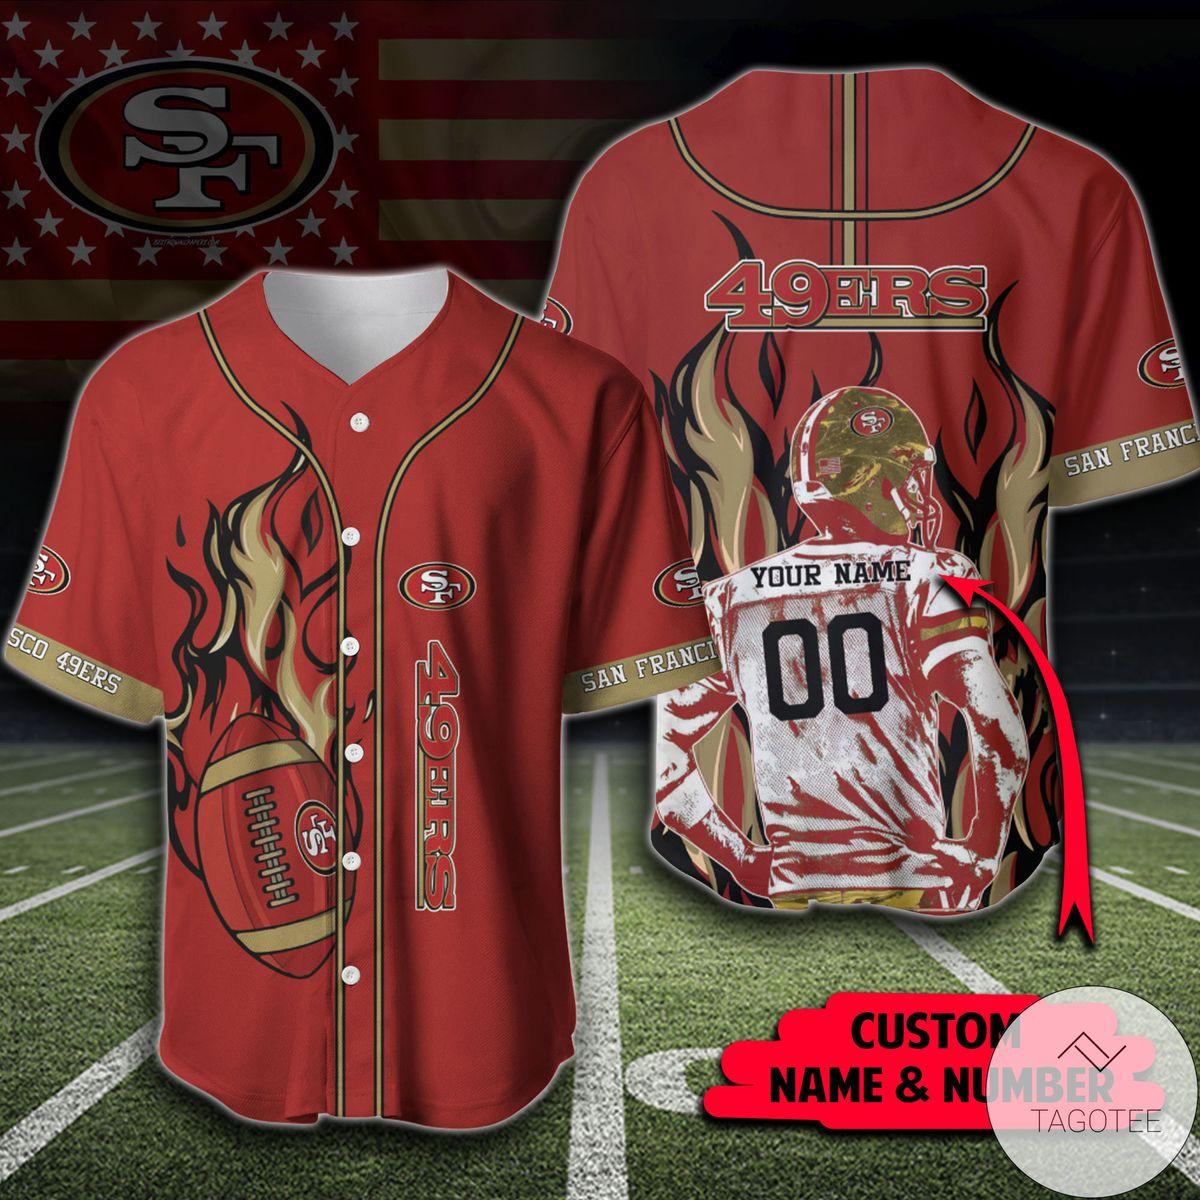 Personalized Nfl San Francisco 49ers Shirt Baseball Jerseys